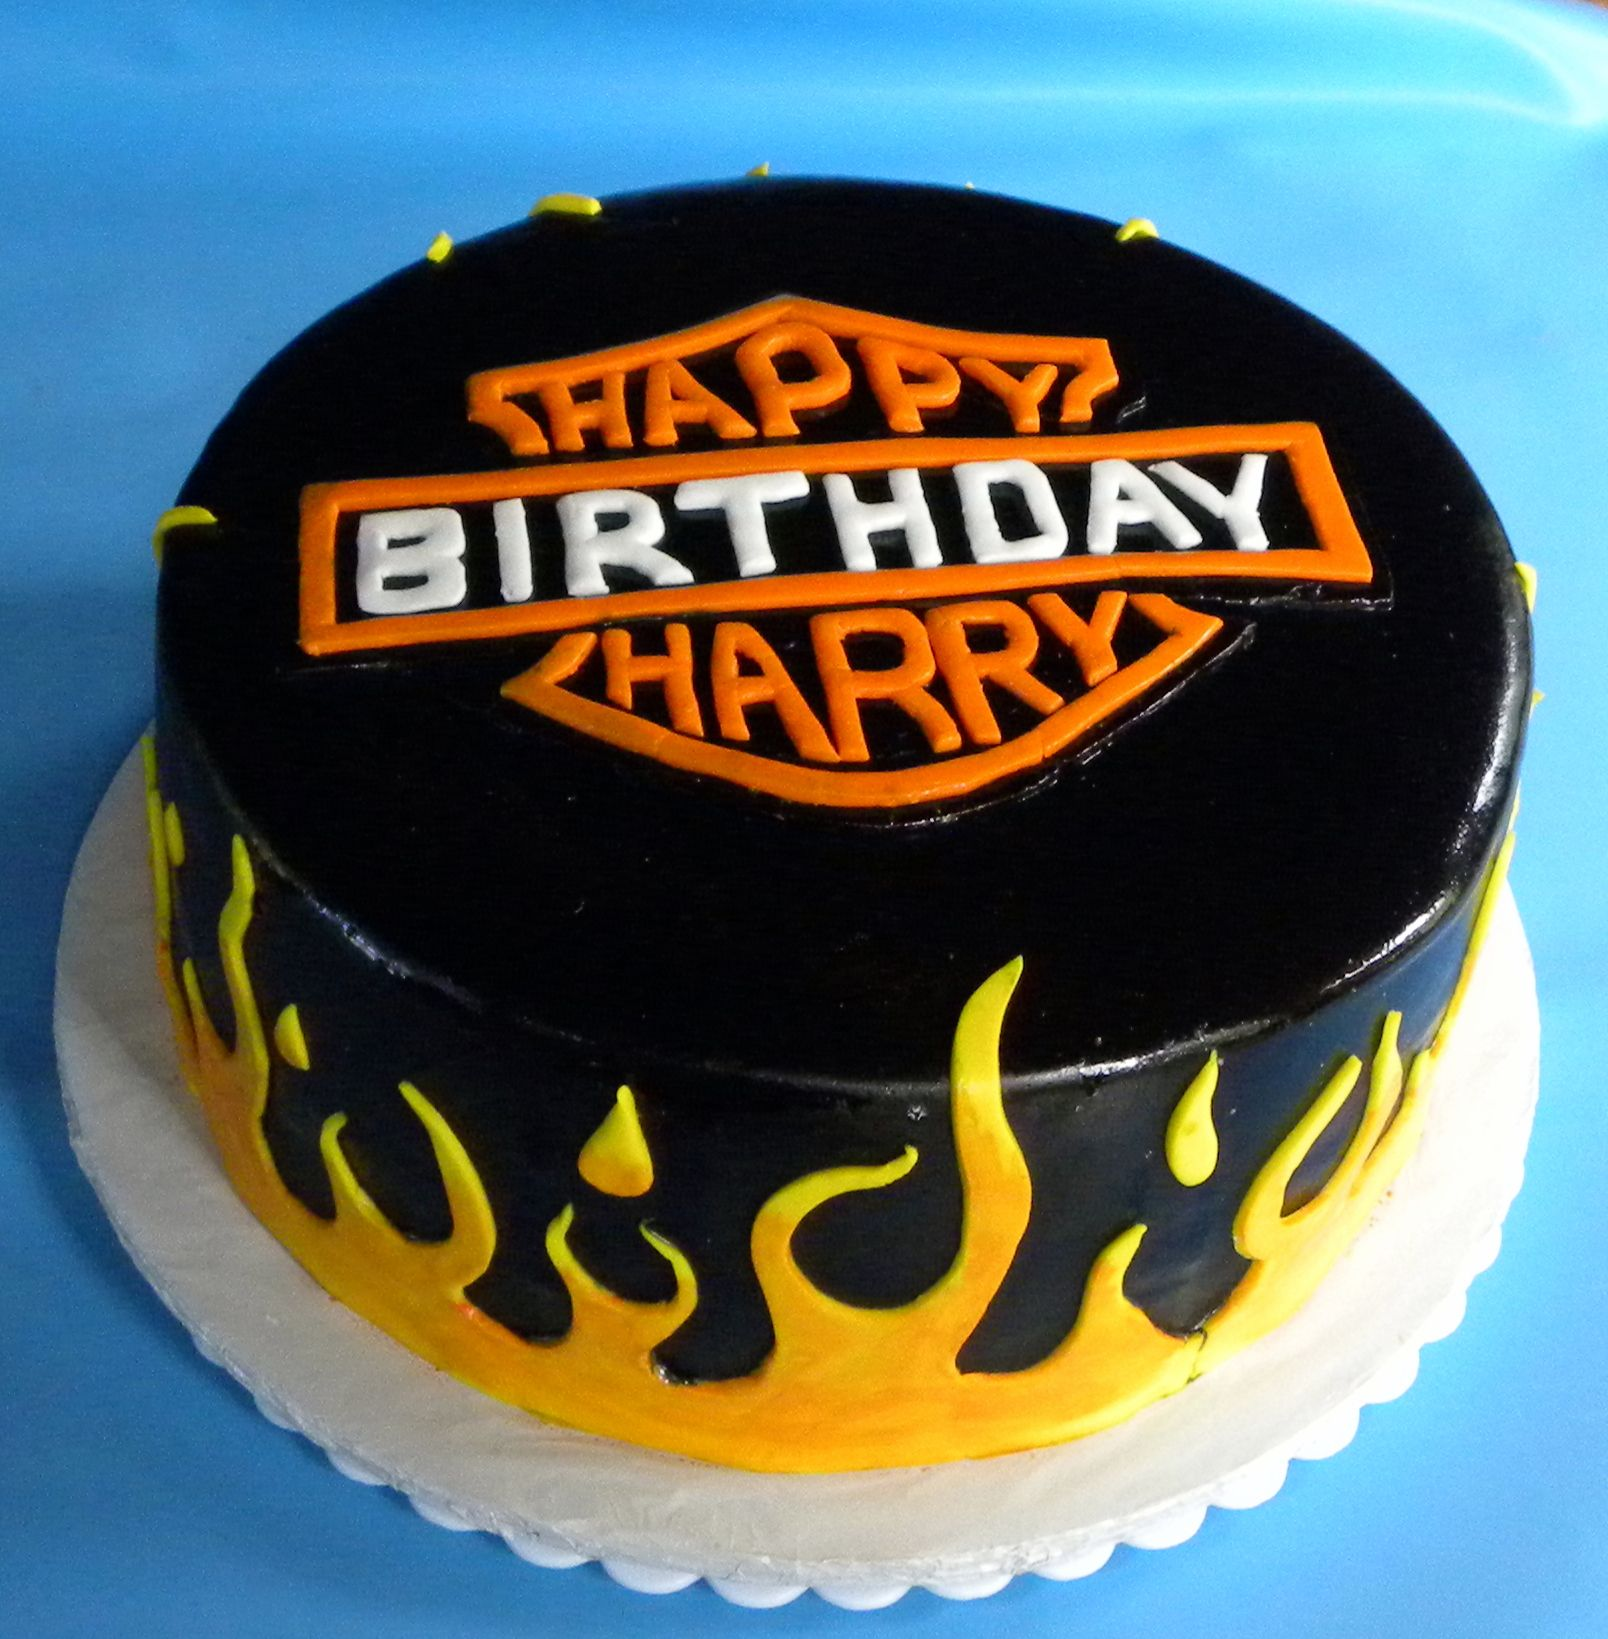 Happy Birthday Harry Cakes We Make Pinterest Birthday Happy